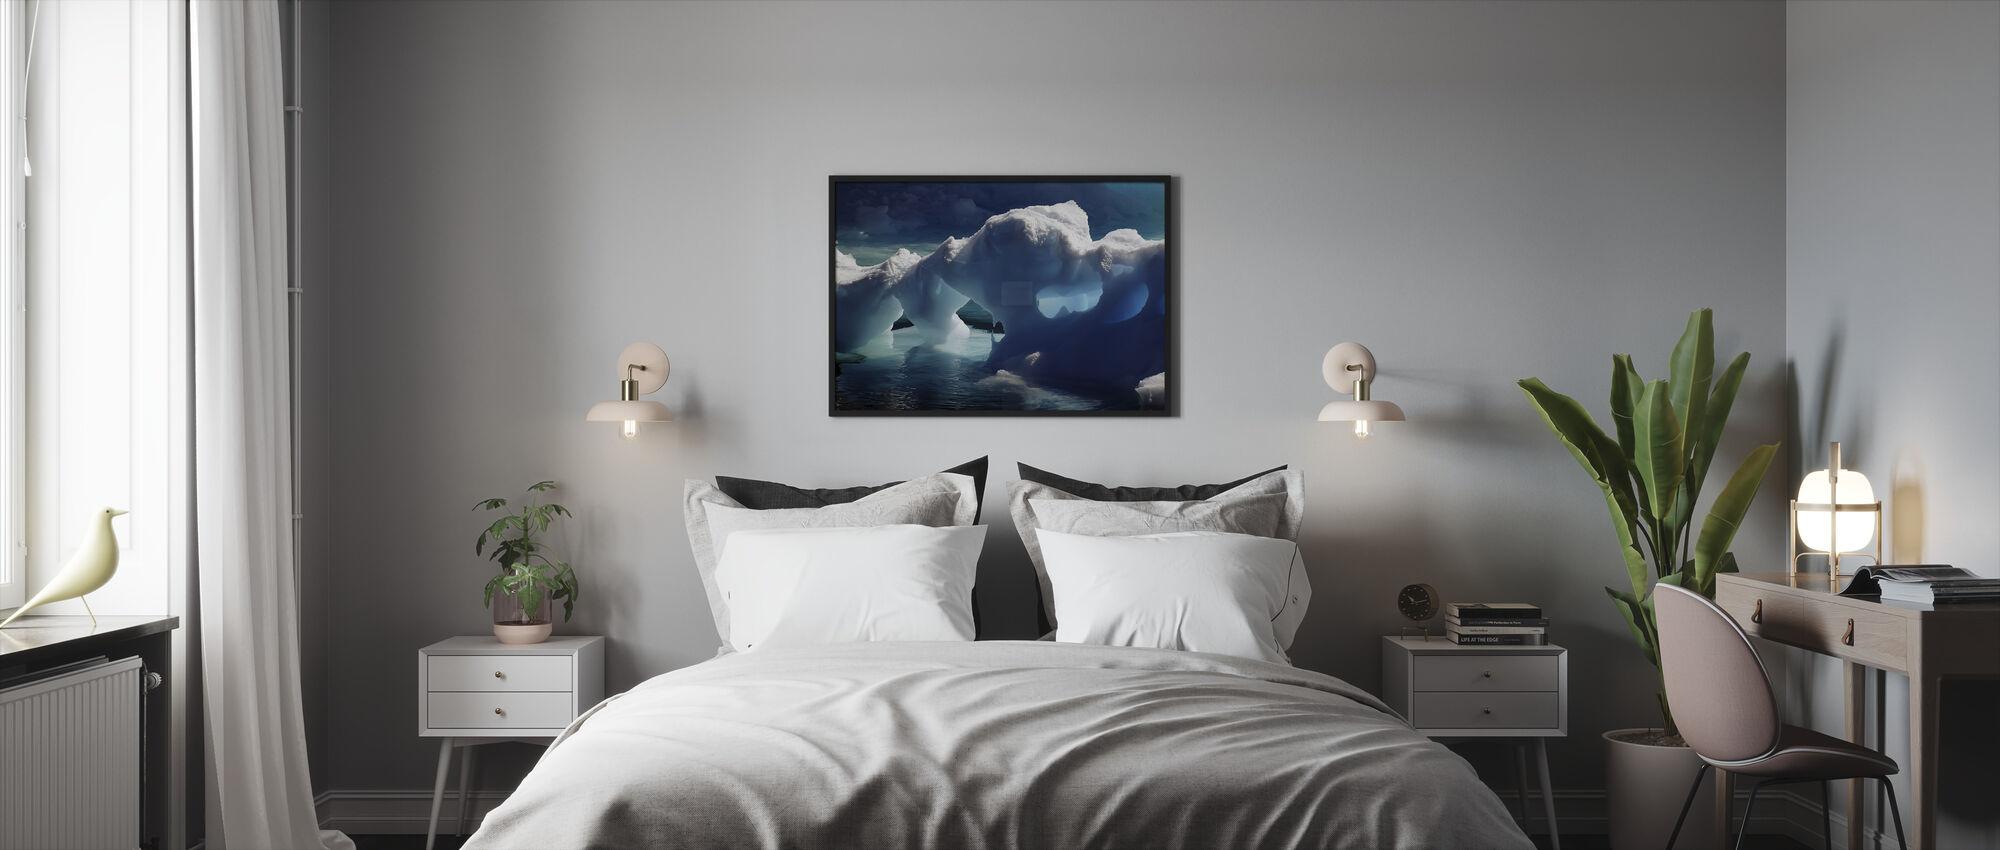 Antarctic Ice Caves - Framed print - Bedroom